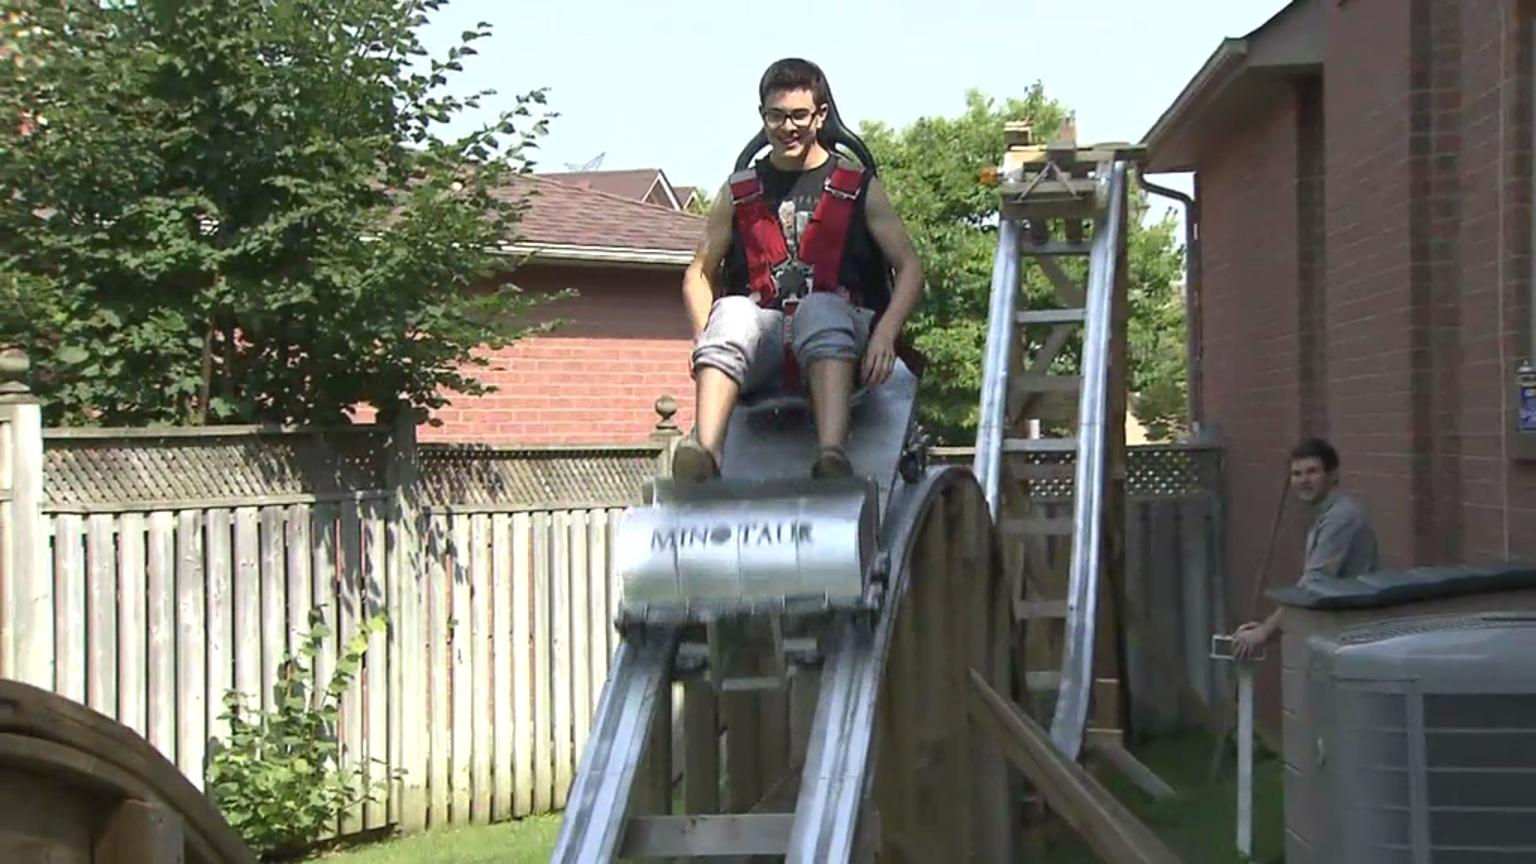 thornhill teen designs backyard roller coaster citynews toronto